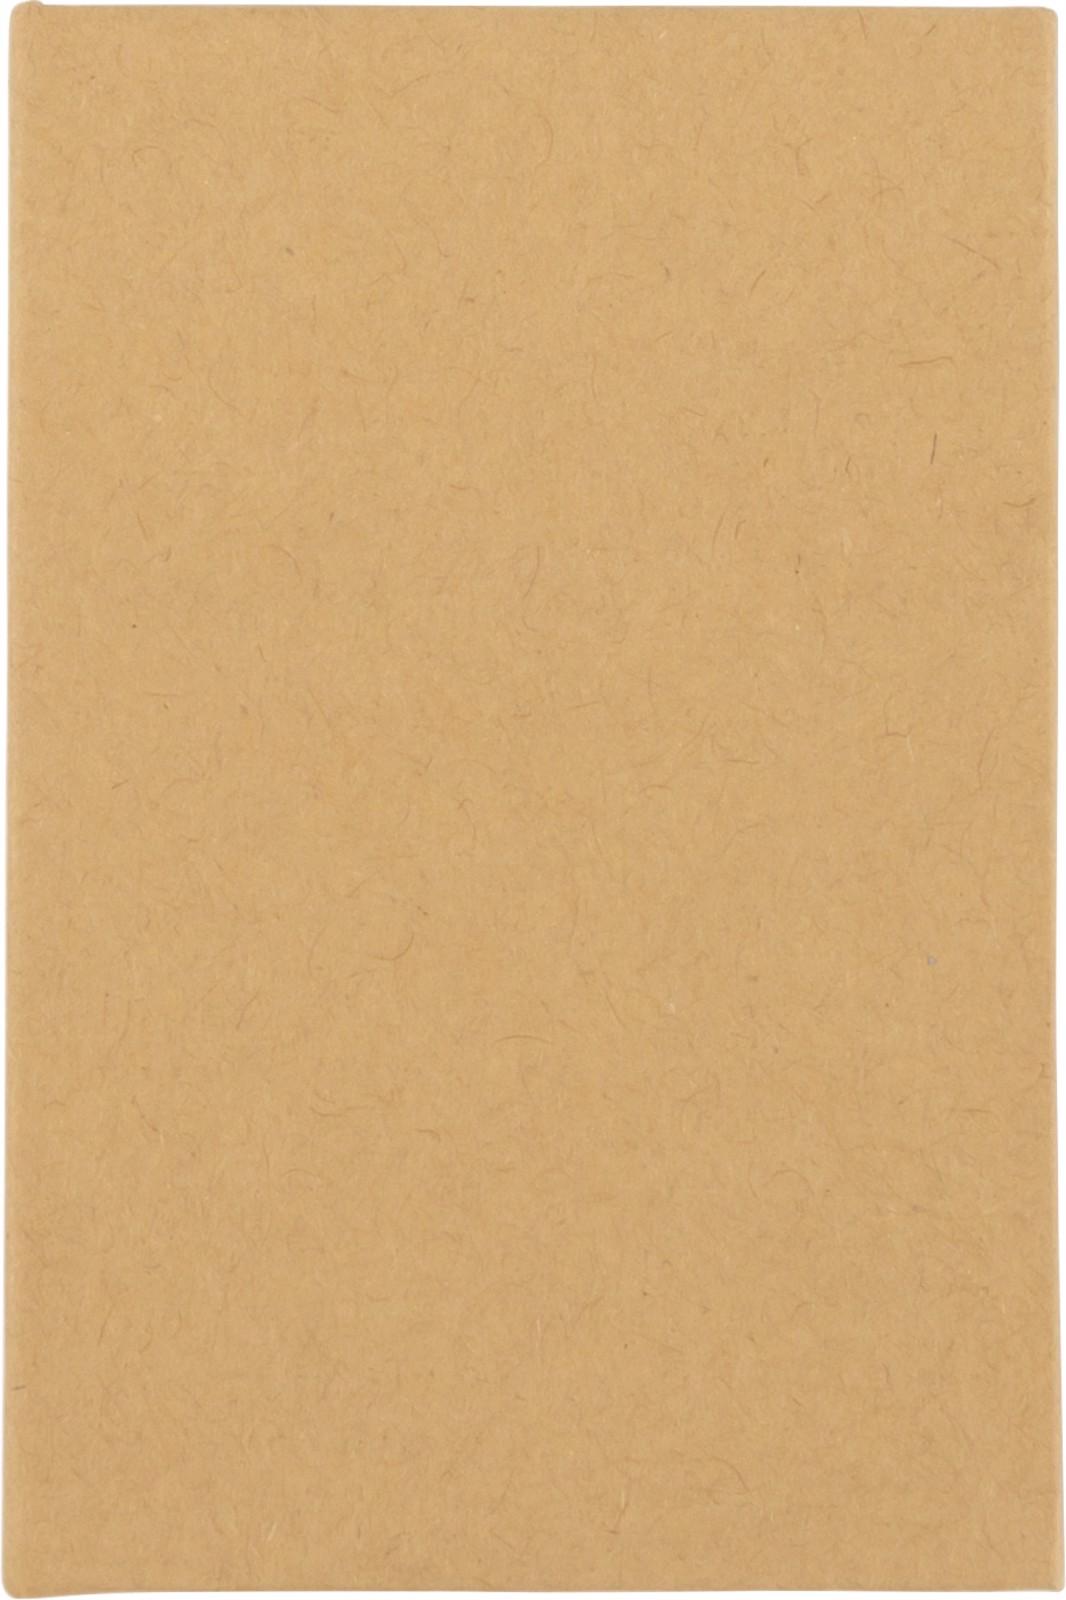 Cardboard sticky note holder - Brown